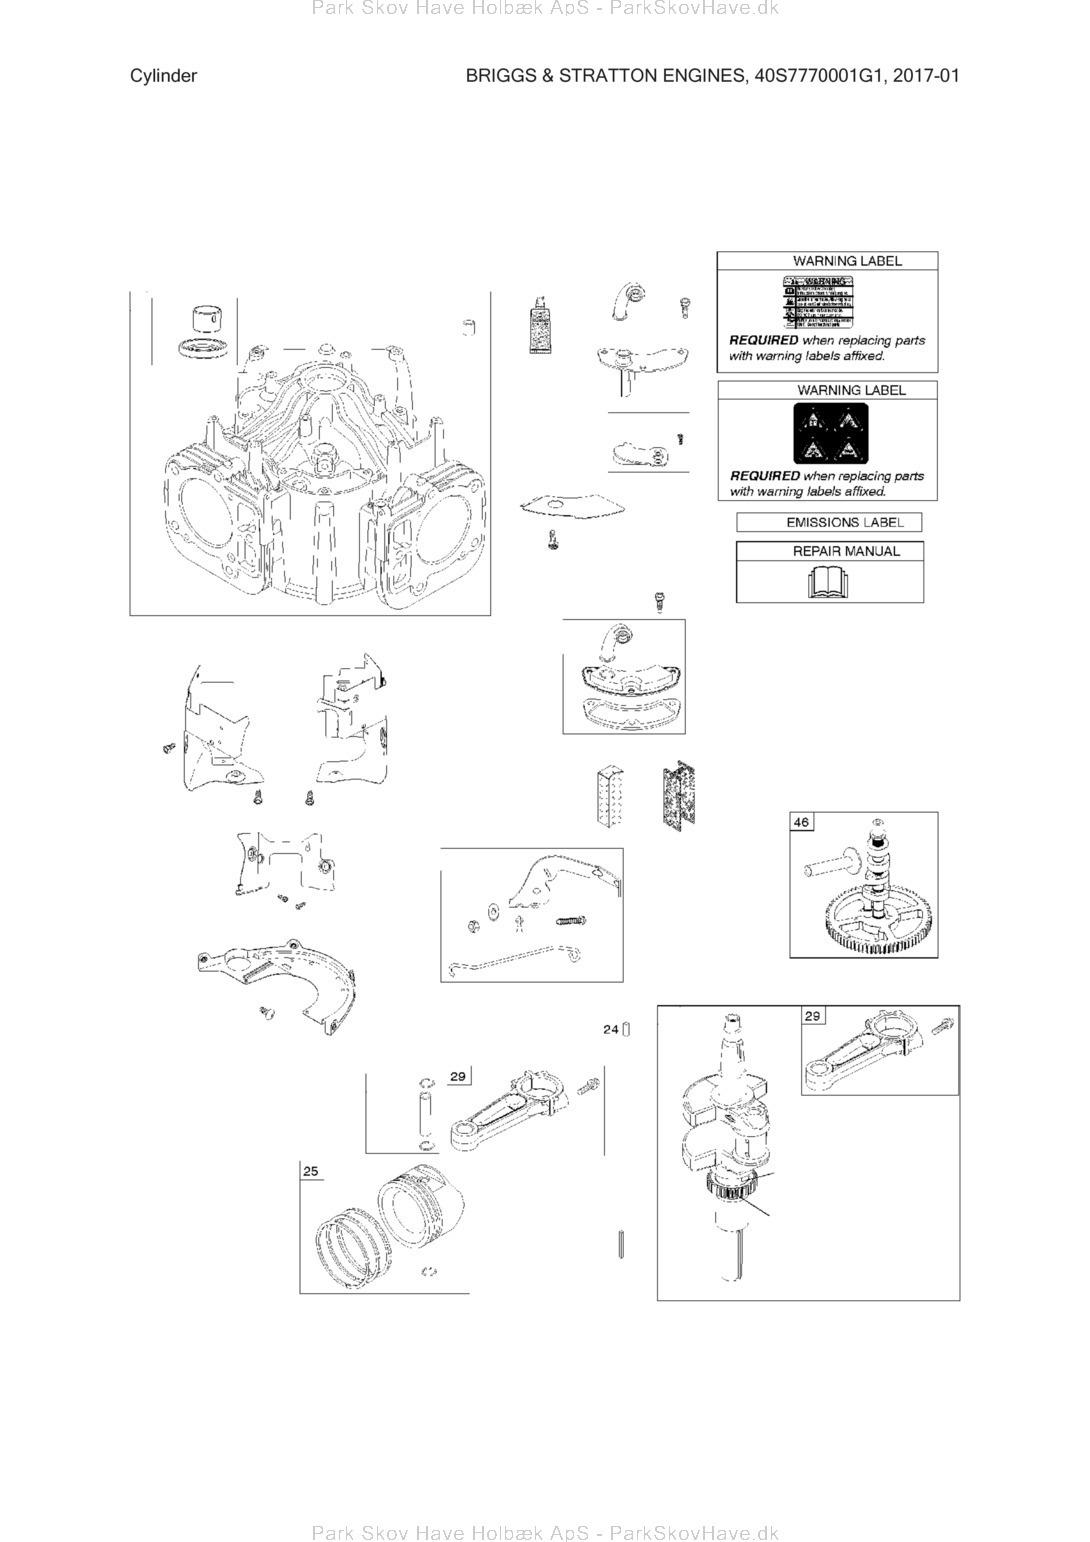 Reservedel Husqvarna Briggs & Stratton Engines